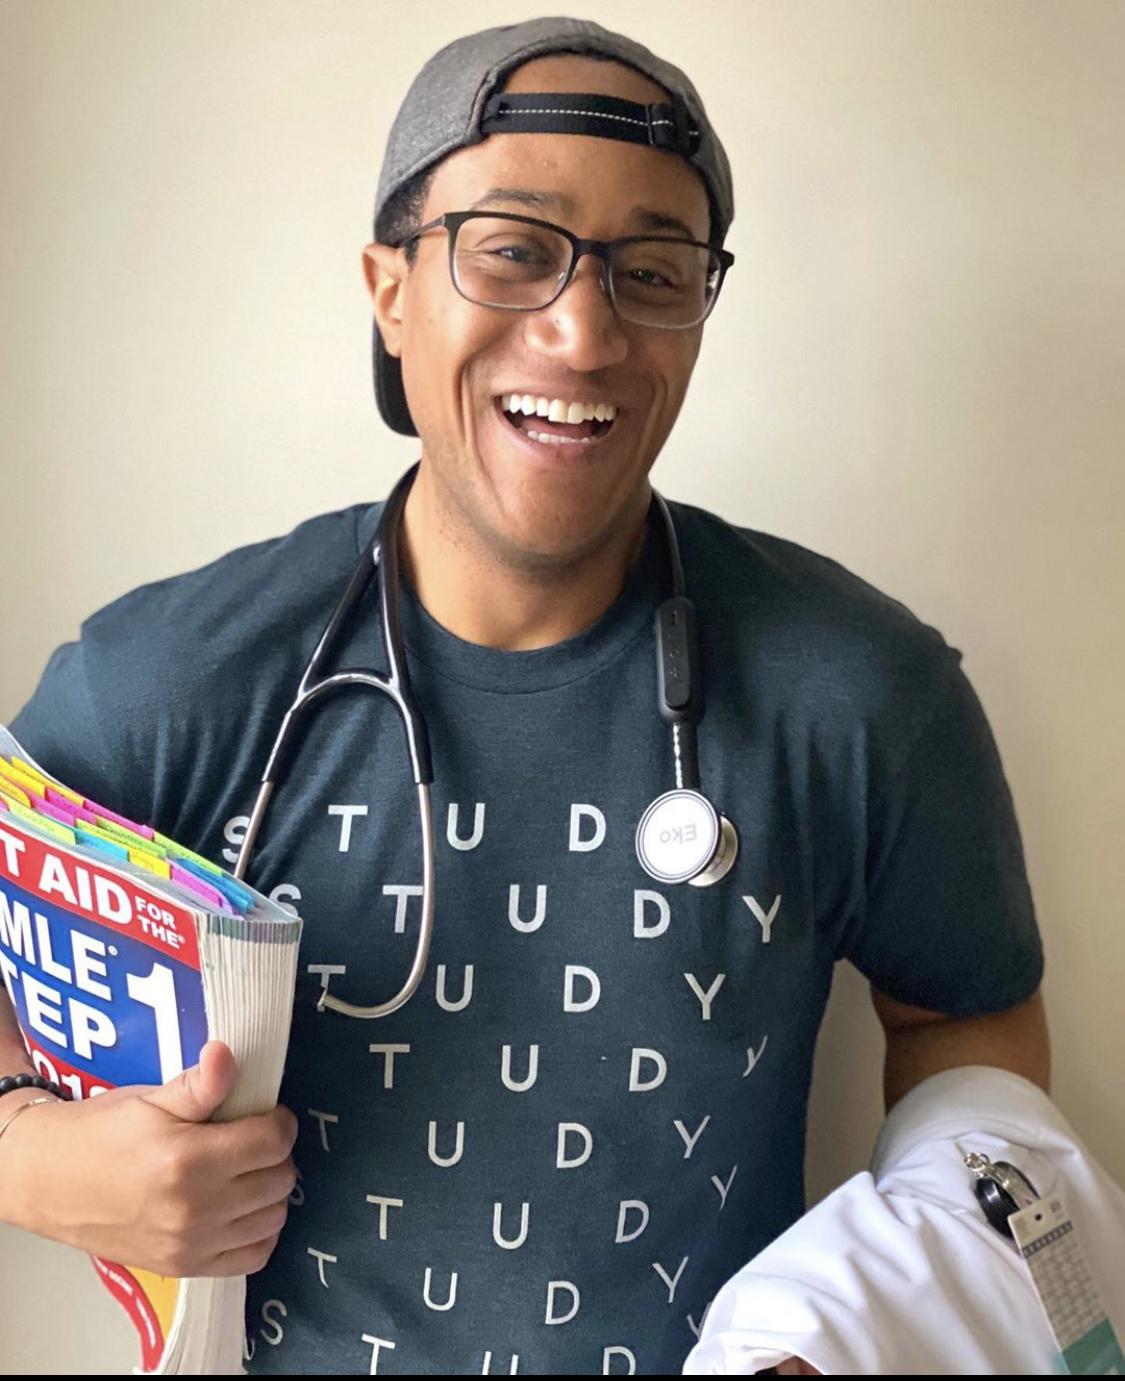 Medical Student Stethoscope